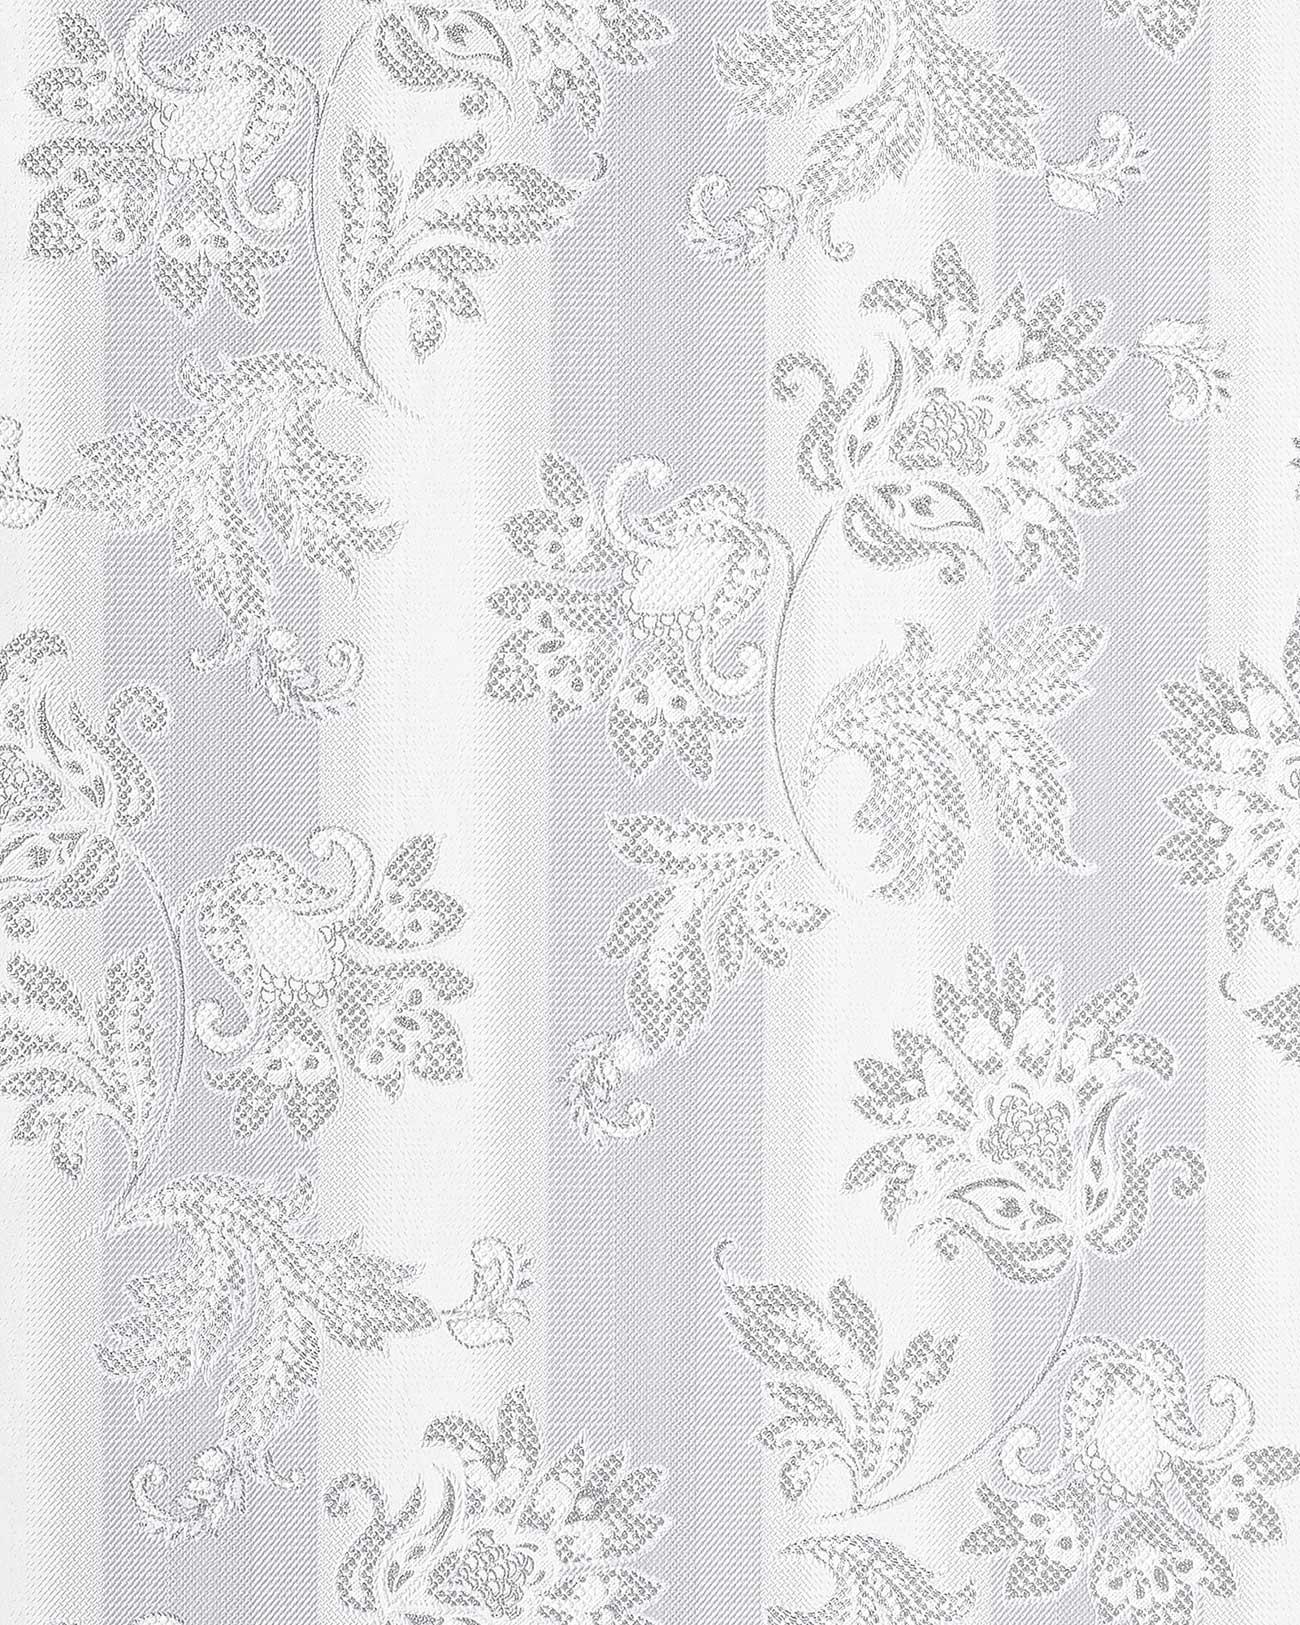 papel pintado vinlico de diseo floral edem flores barroco gris gris claro blanco plata m